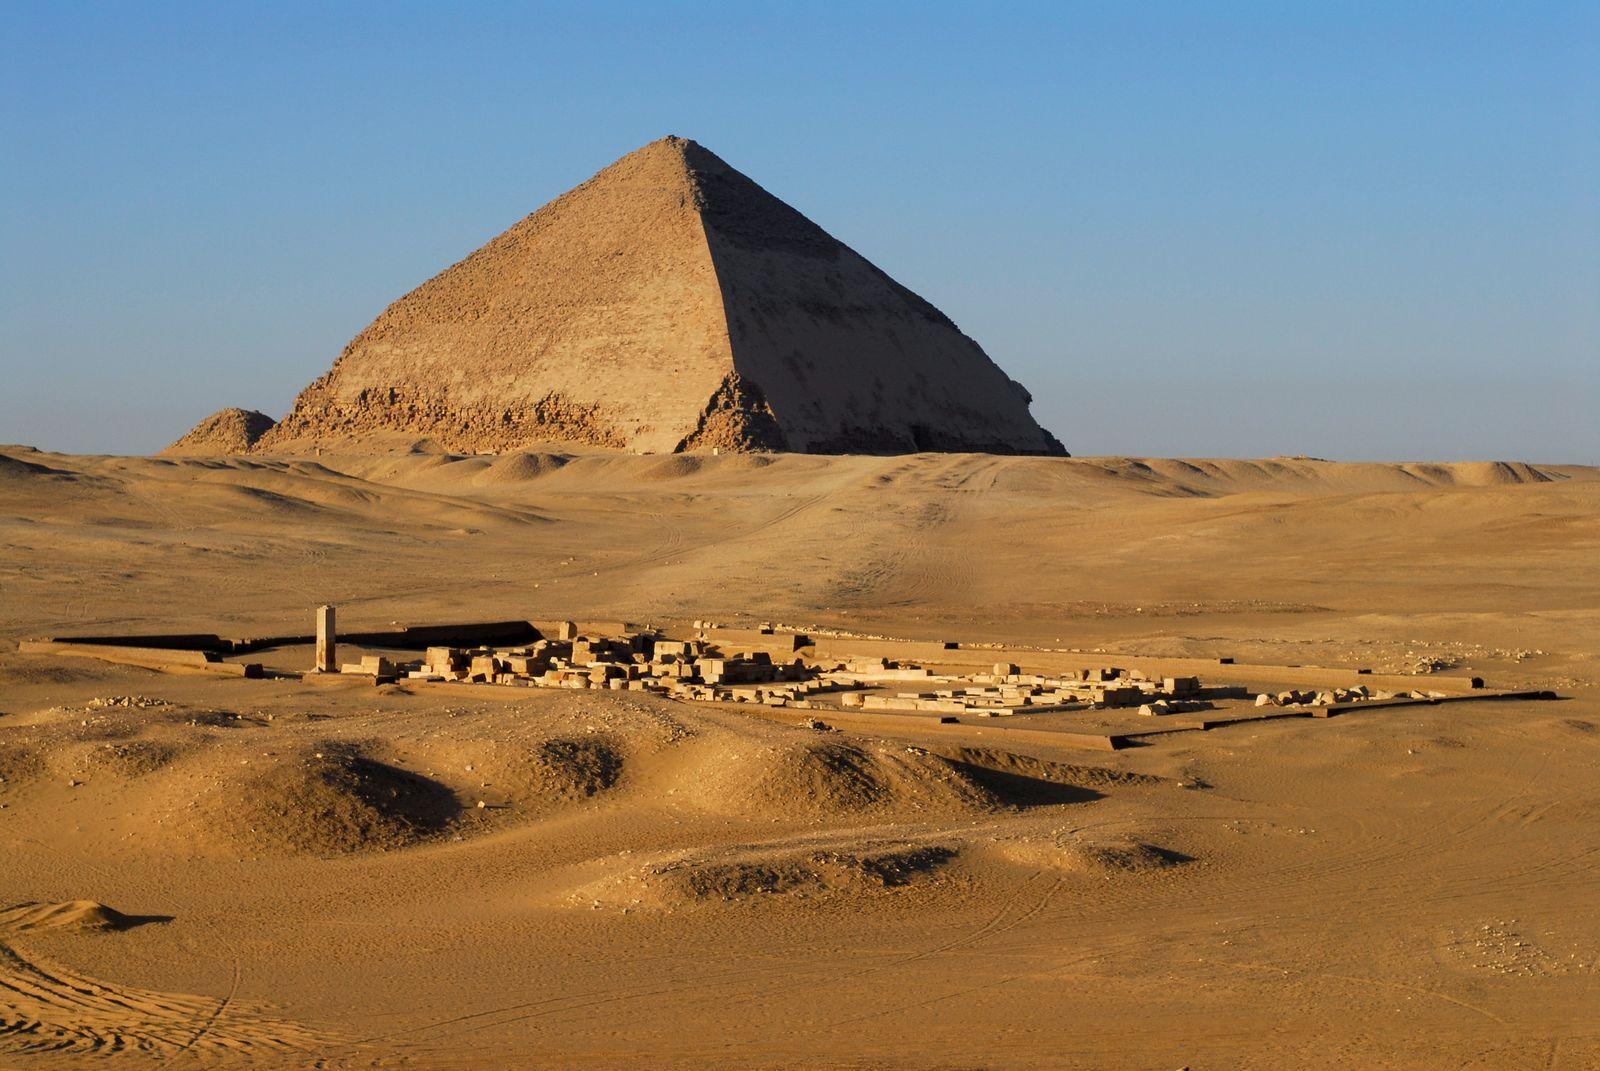 Neue Funde in Dahschur - Knickpyramide des Pharao Snofru